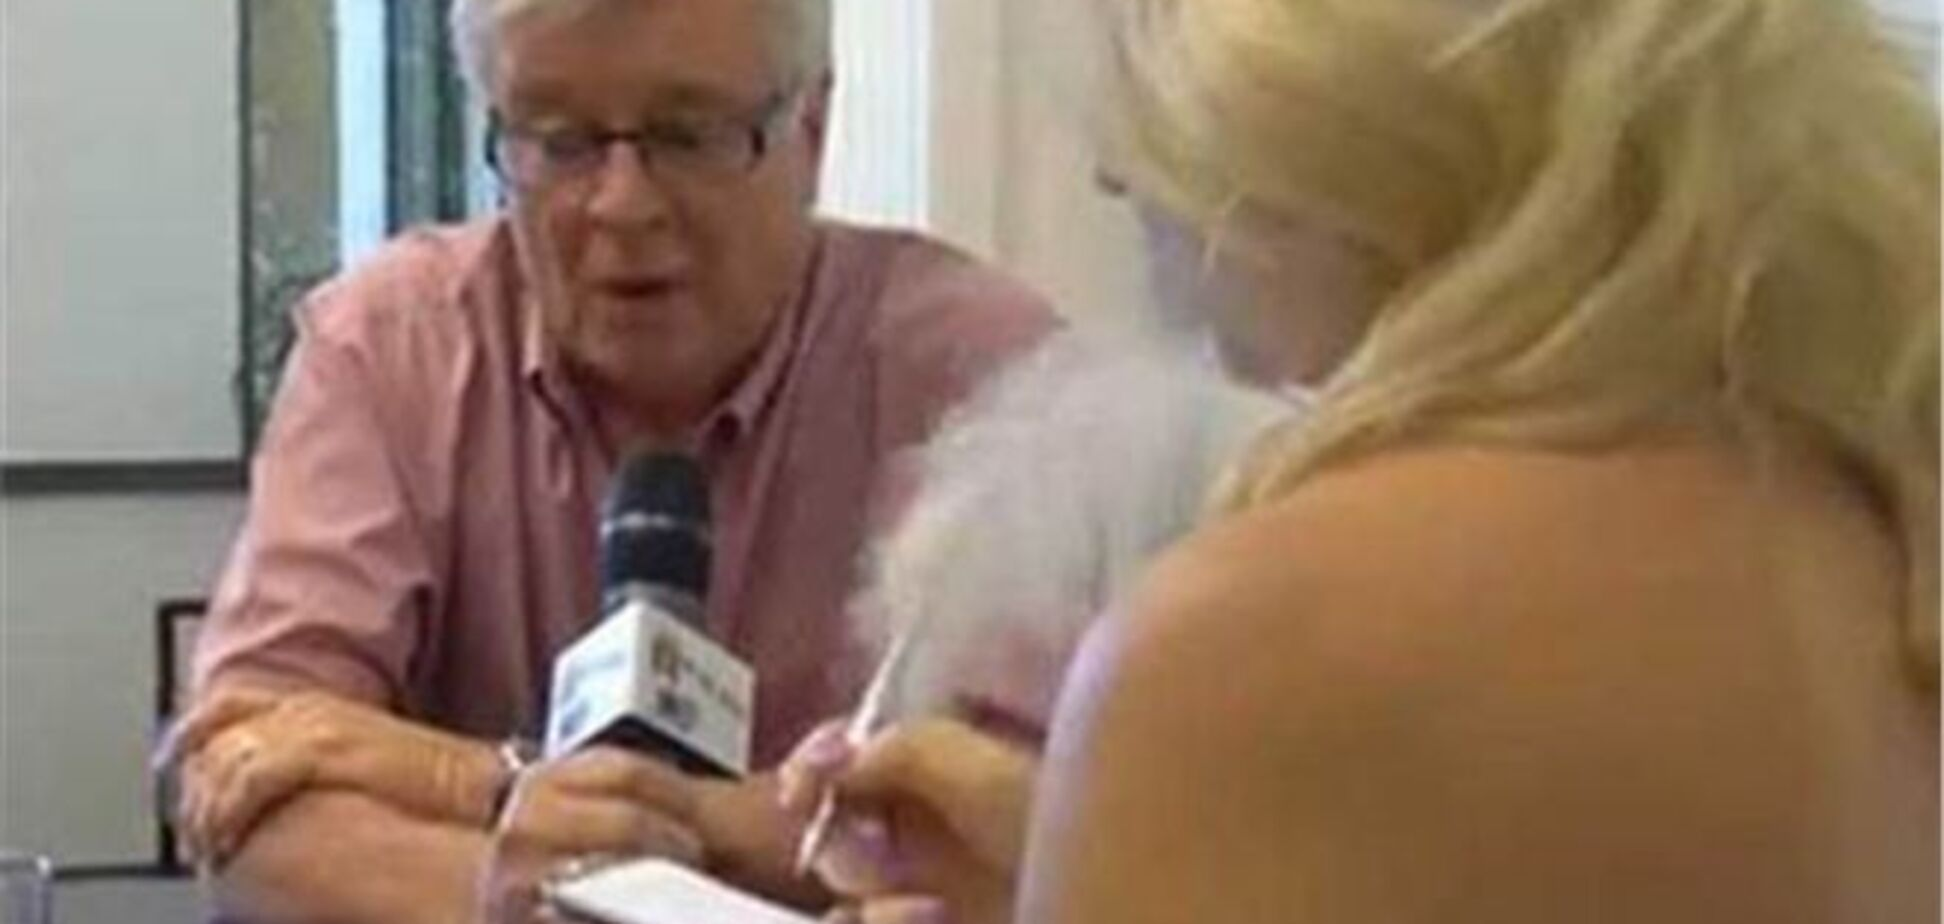 Журналистка разделась перед мэром во время интервью